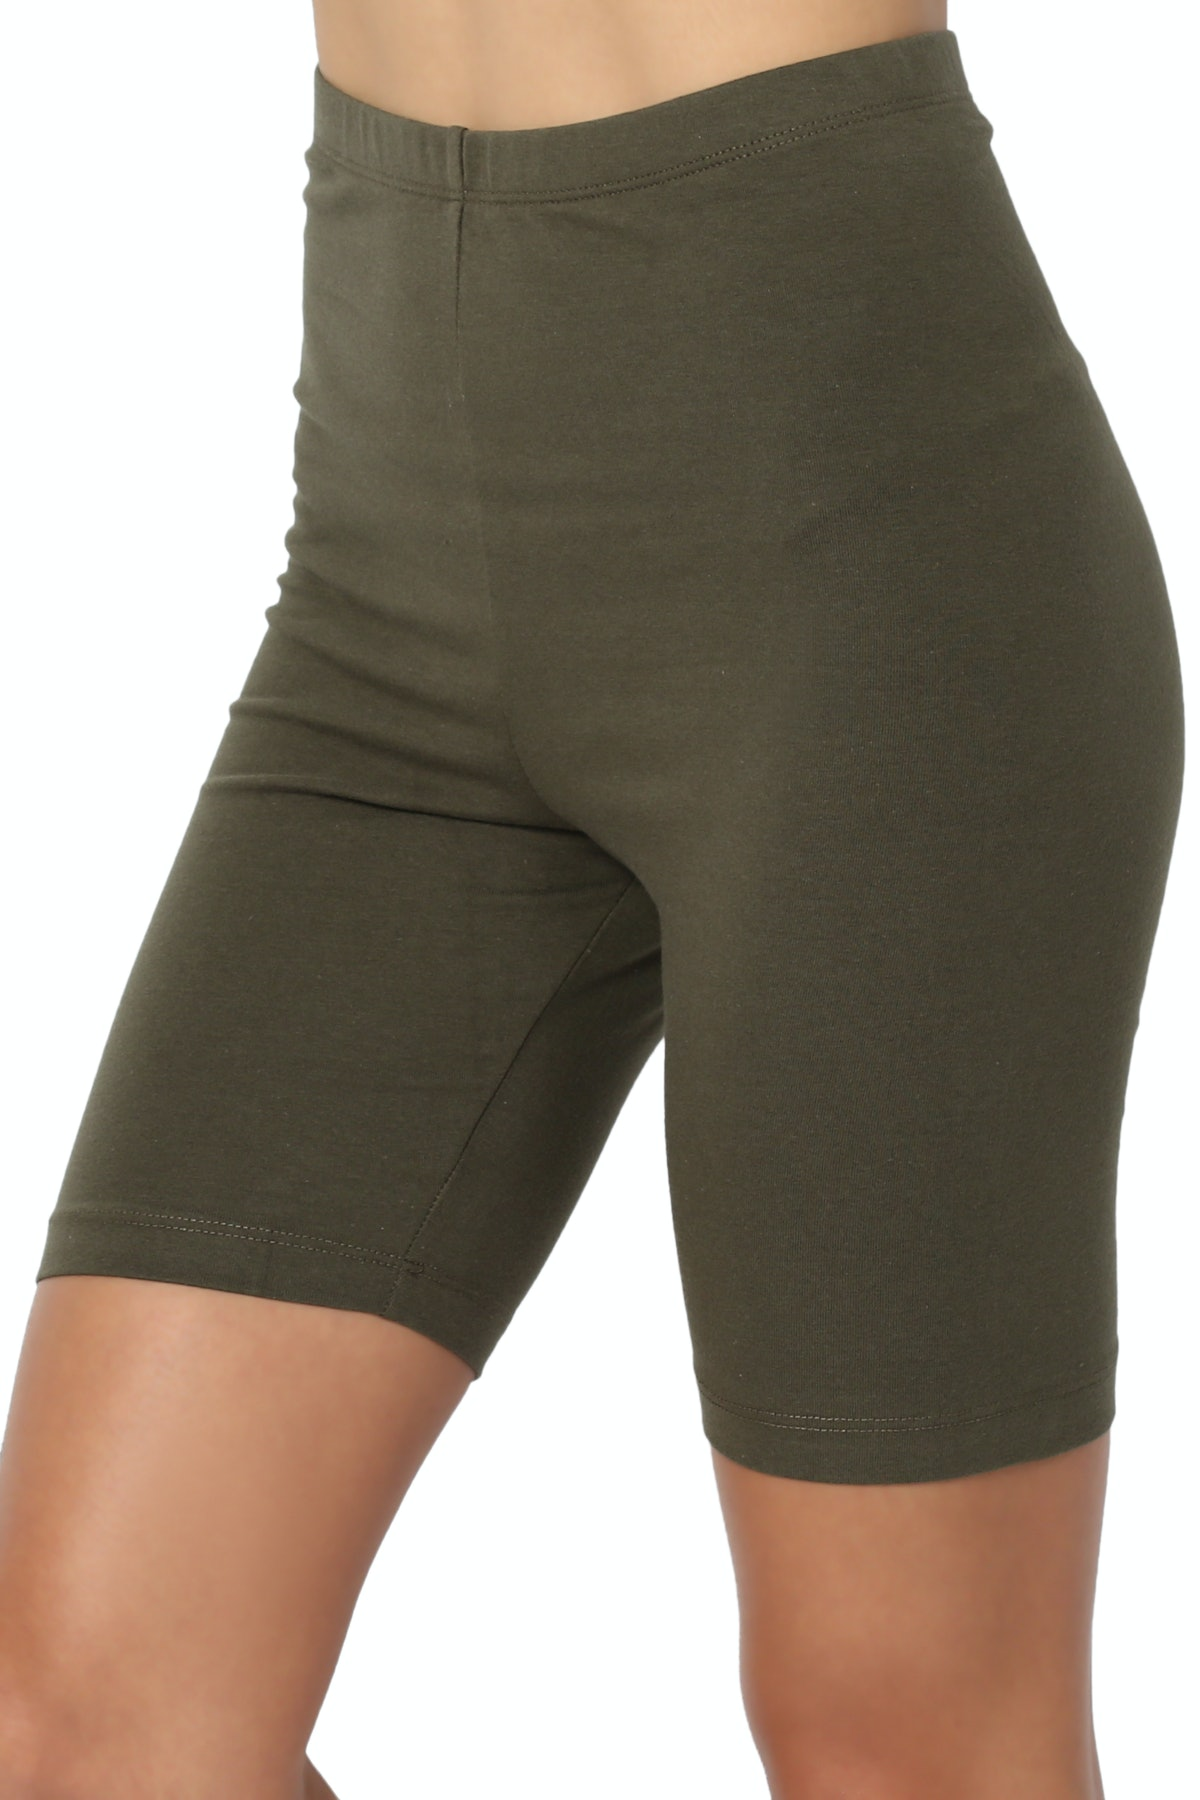 TheMogan Women's Cotton Active Shorts